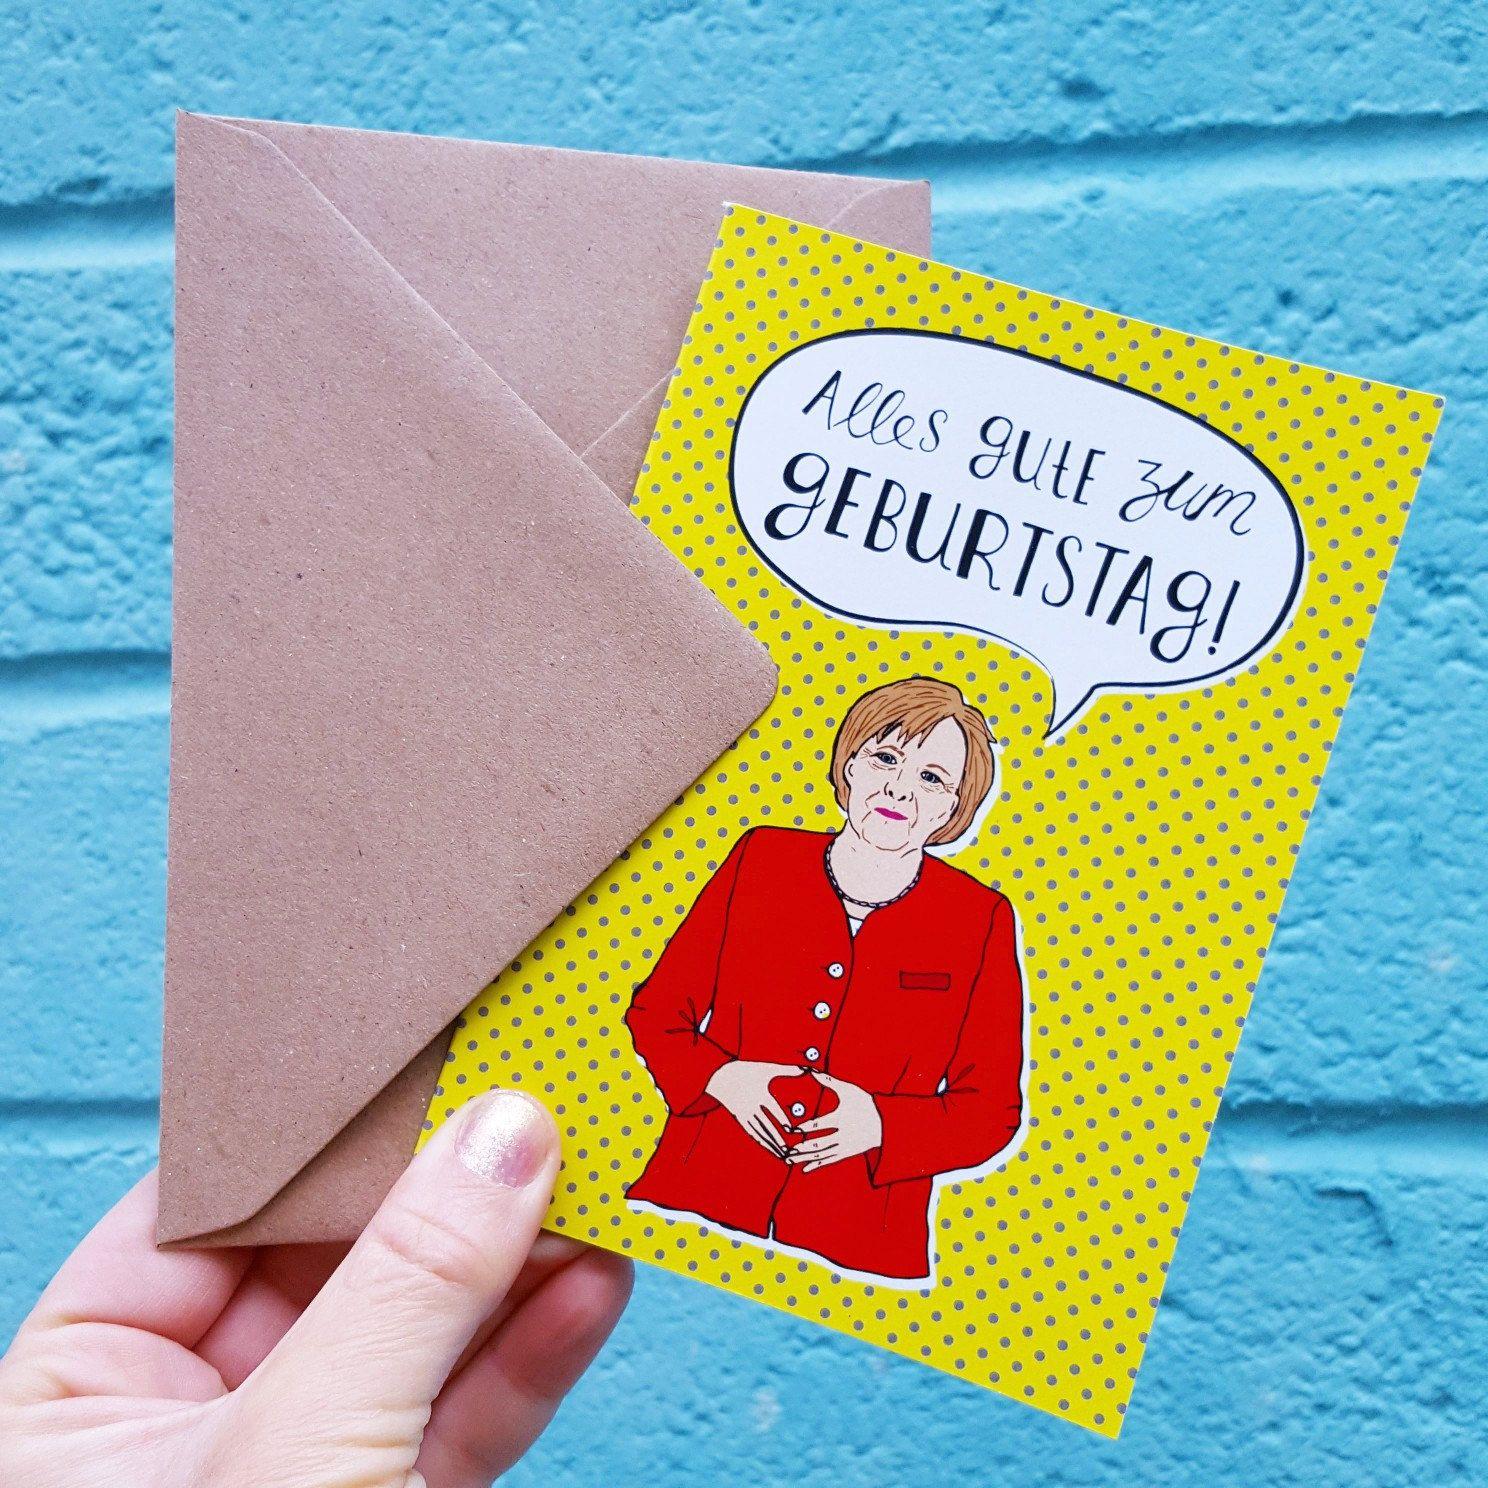 Angela Merkel Birthday Card German Birthday Card Alles Gute Zum